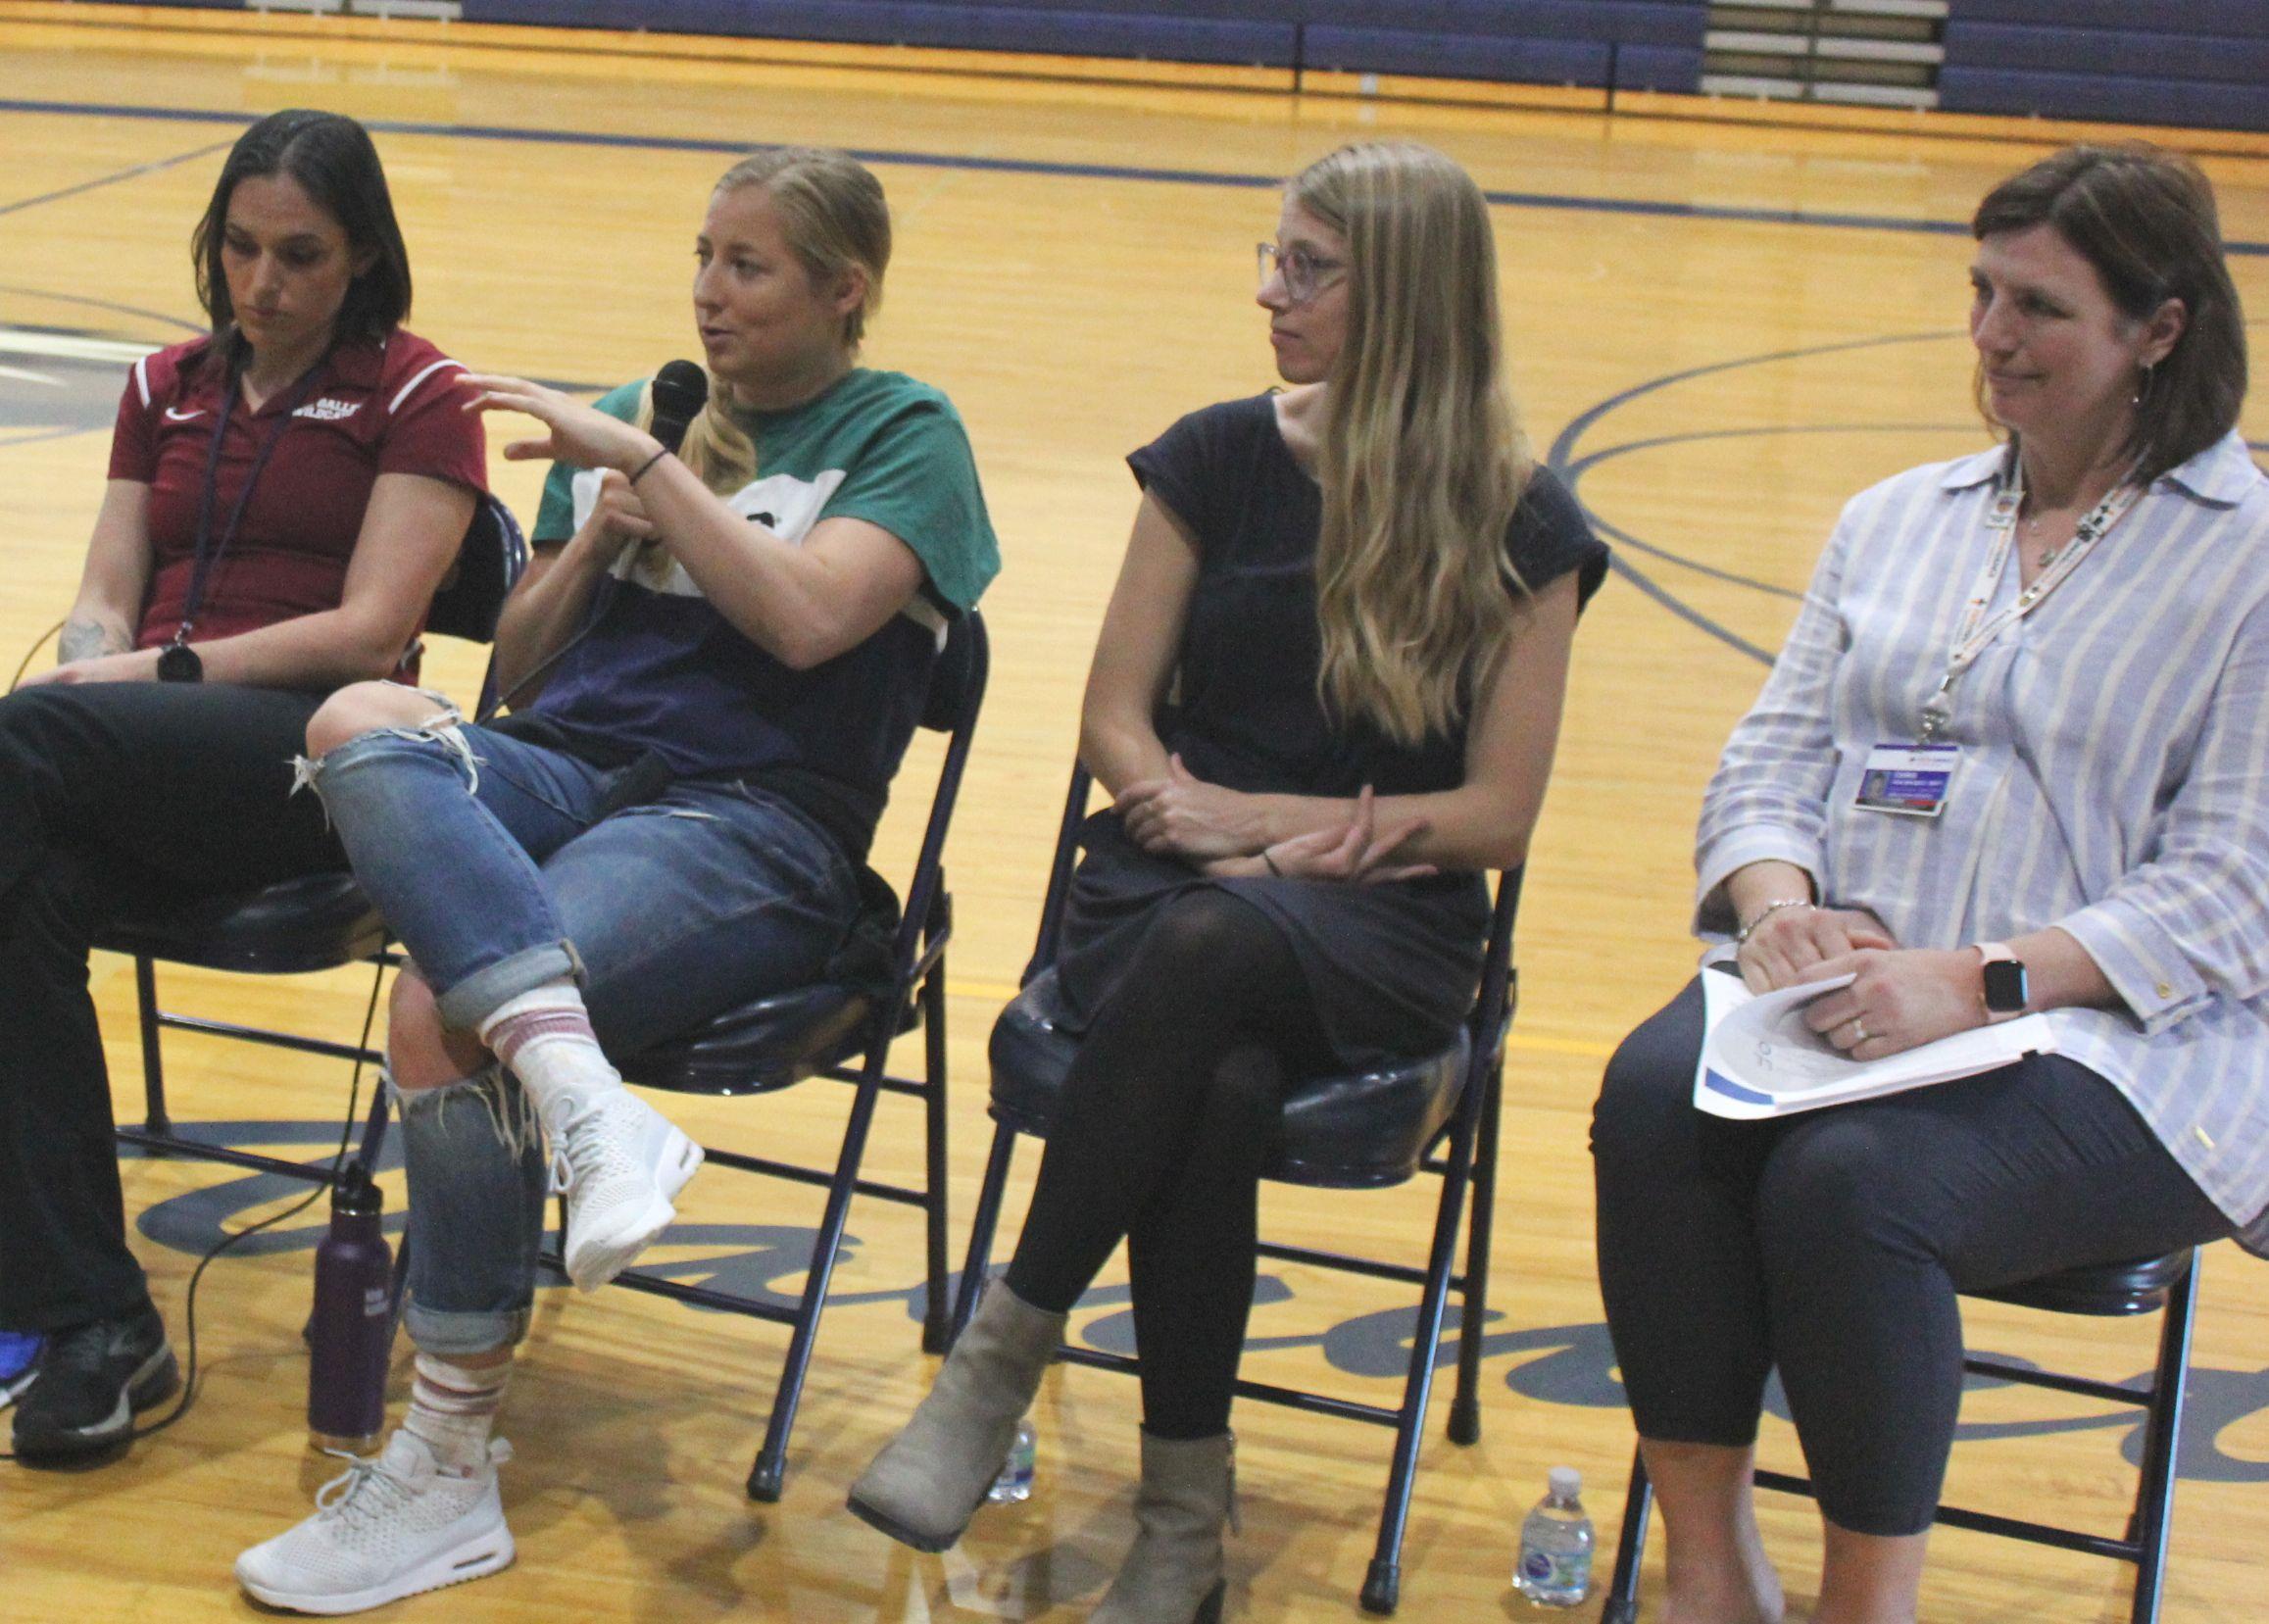 Girls on Track Workshop panelists encourage girls to stay active (L-R Amanda Phillips, Kendall Johnson, Alex Rudd, Chris Van Wagner).